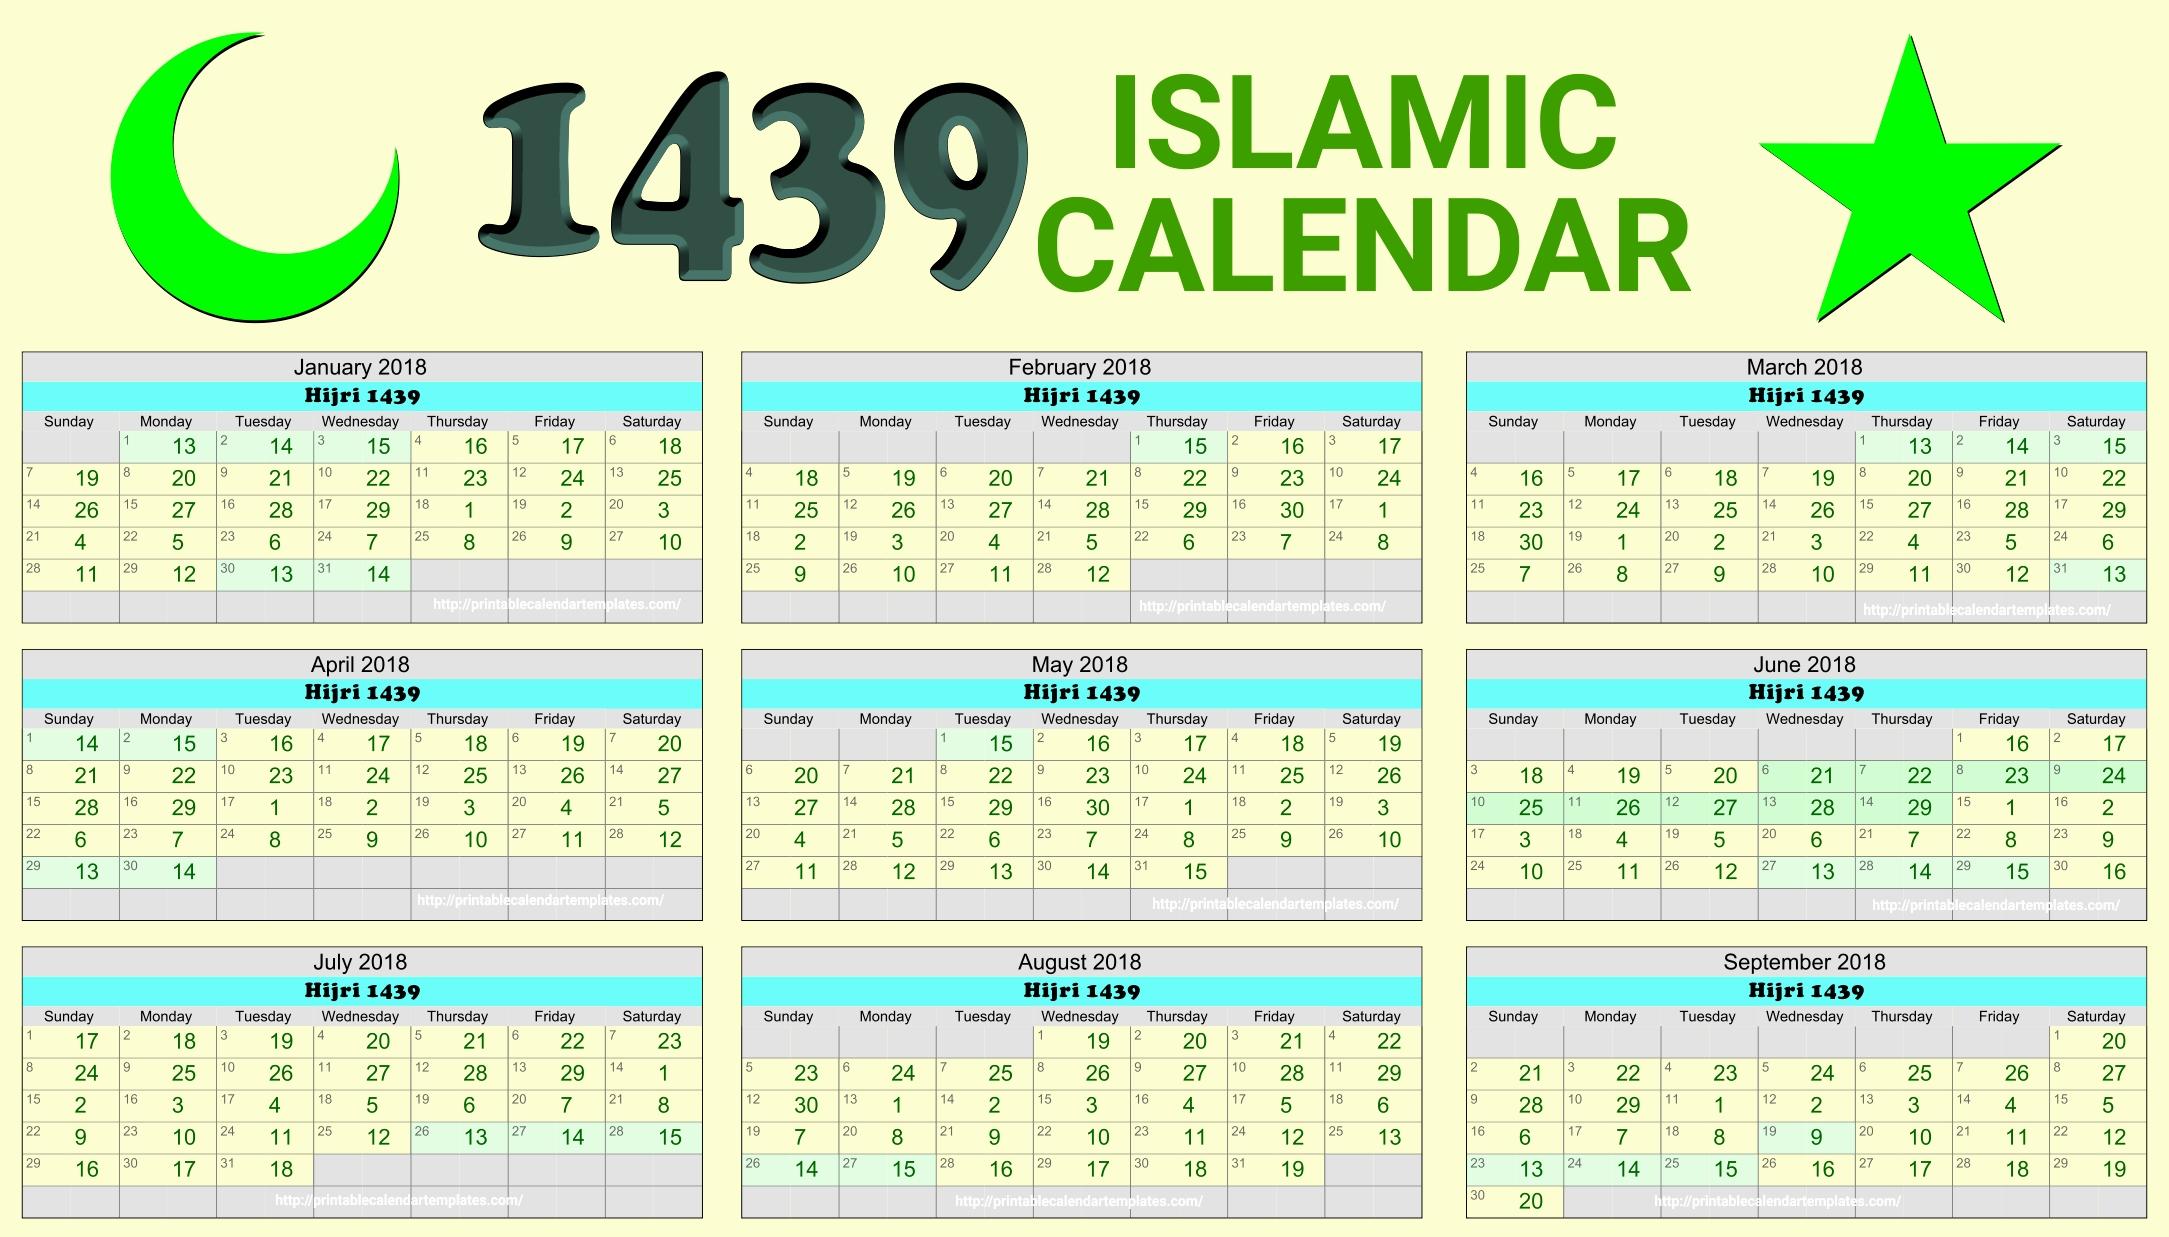 Islamic Calendar Months Islamic Calendar 2018 Hijri Calendar 1439 throughout Hijri Calendar 1438 With Gregorian Calendar